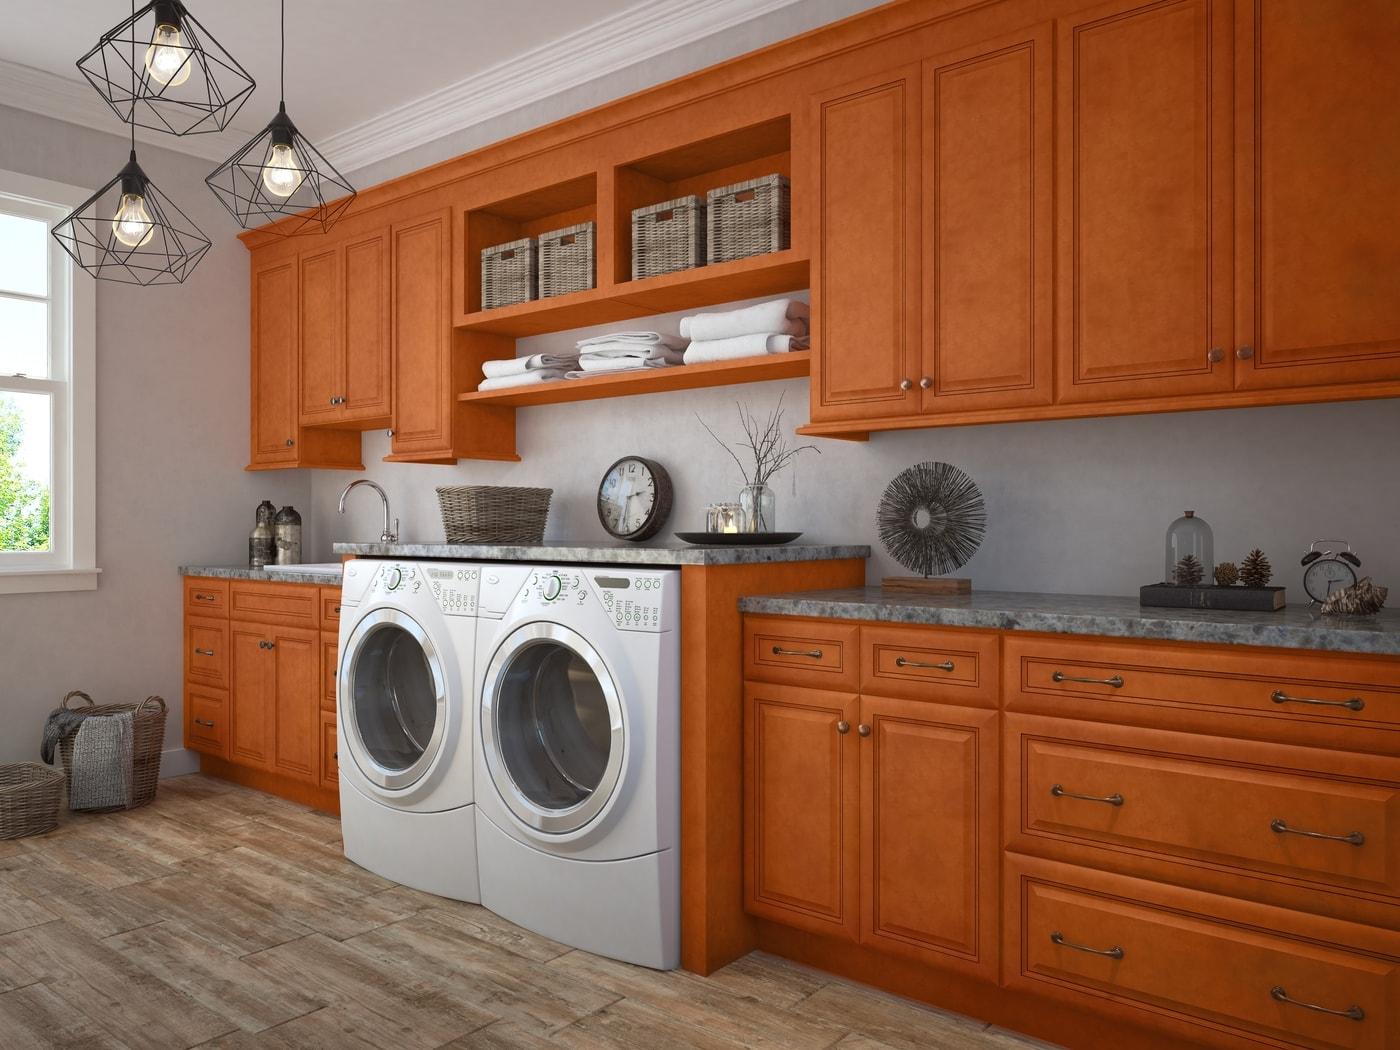 Regency Spiced Glazed RTA Laundry Room Cabinets - The RTA ... on Laundry Room Cabinets  id=49286